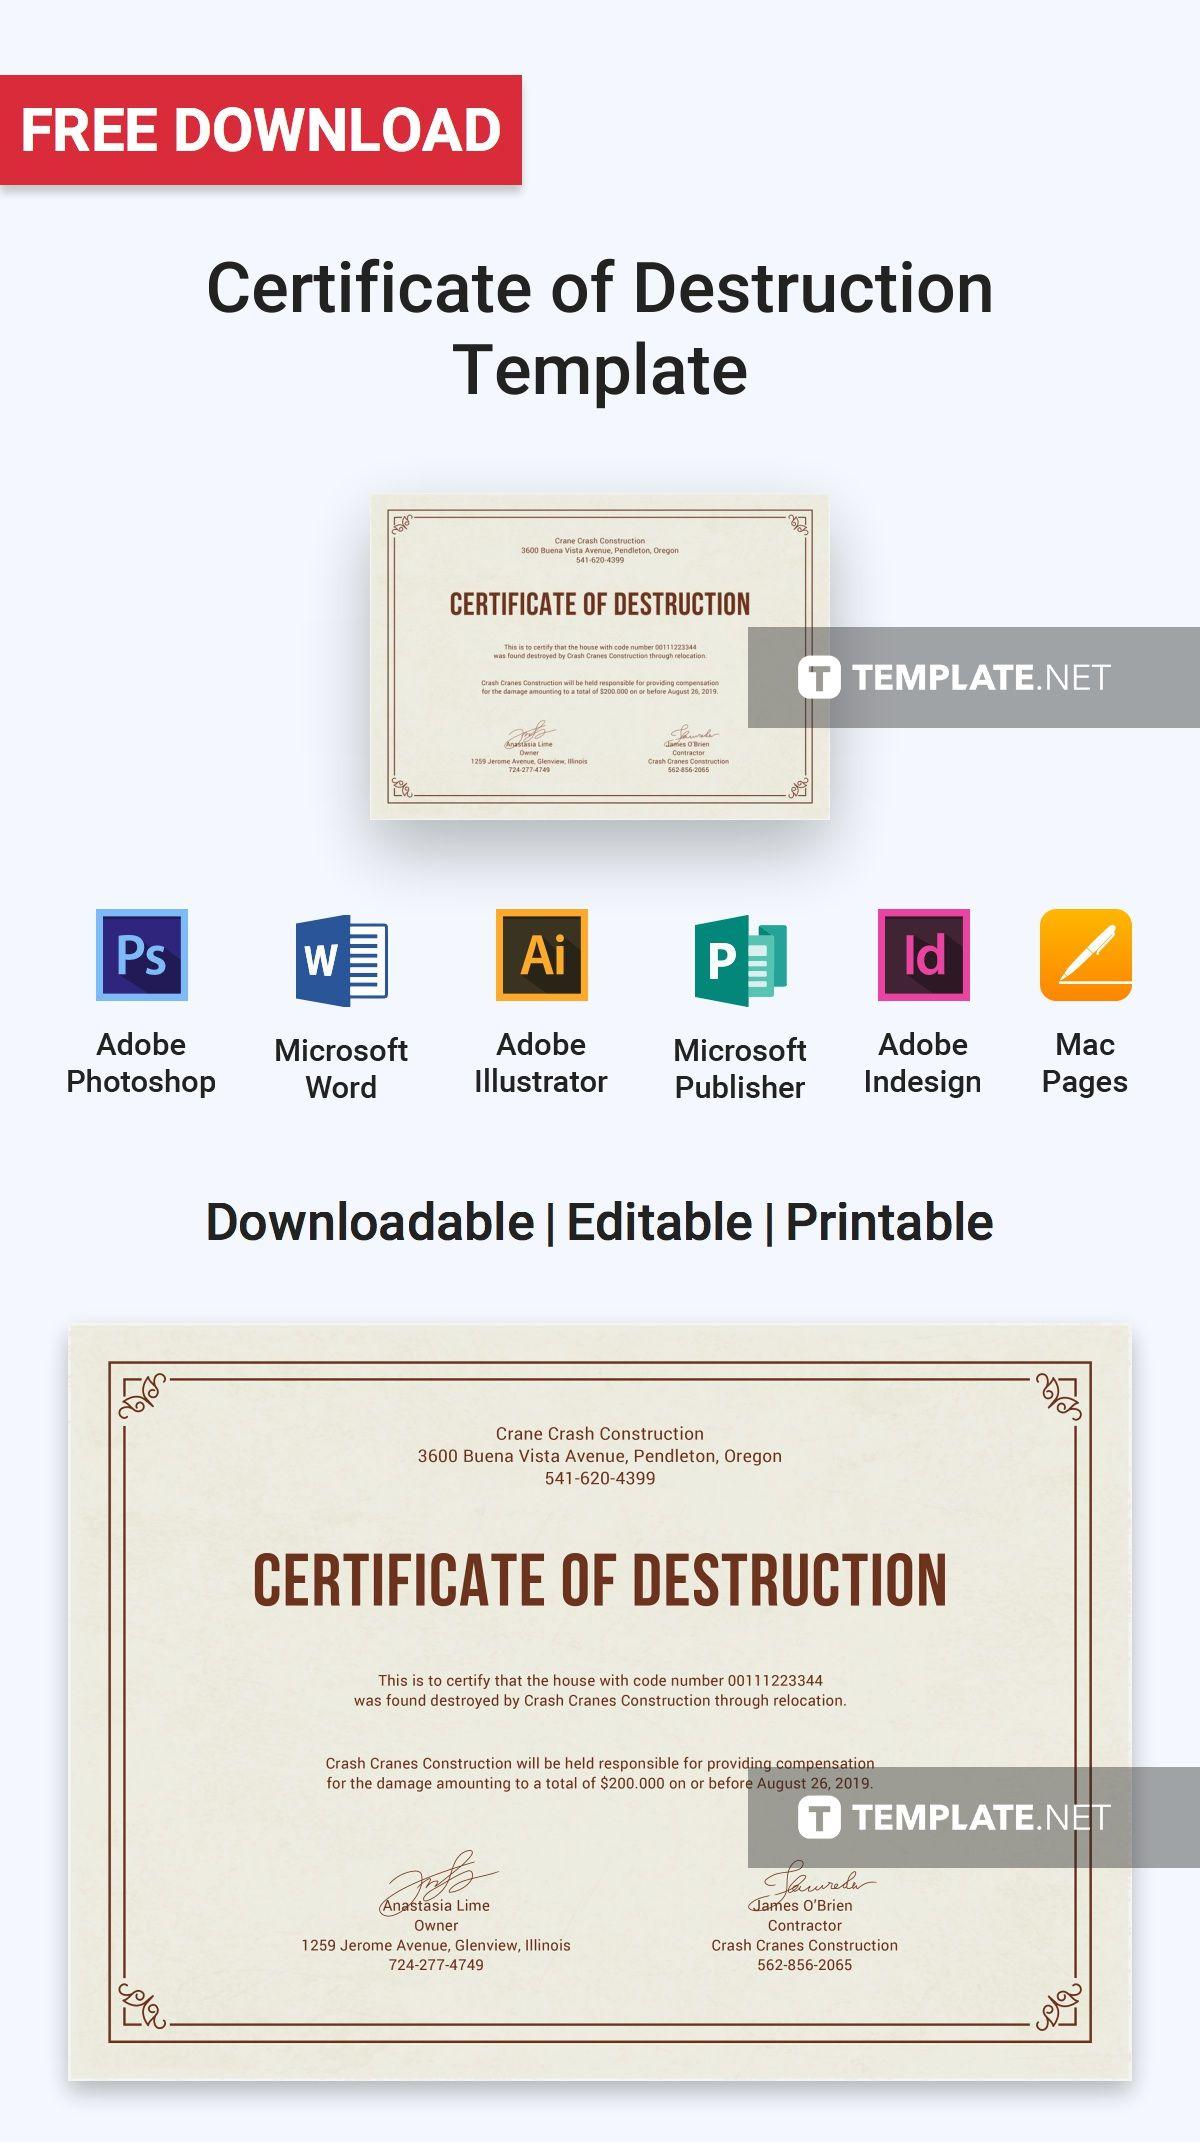 Free Certificate Of Destruction | Certificate Templates With Regard To Free Certificate Of Destruction Template